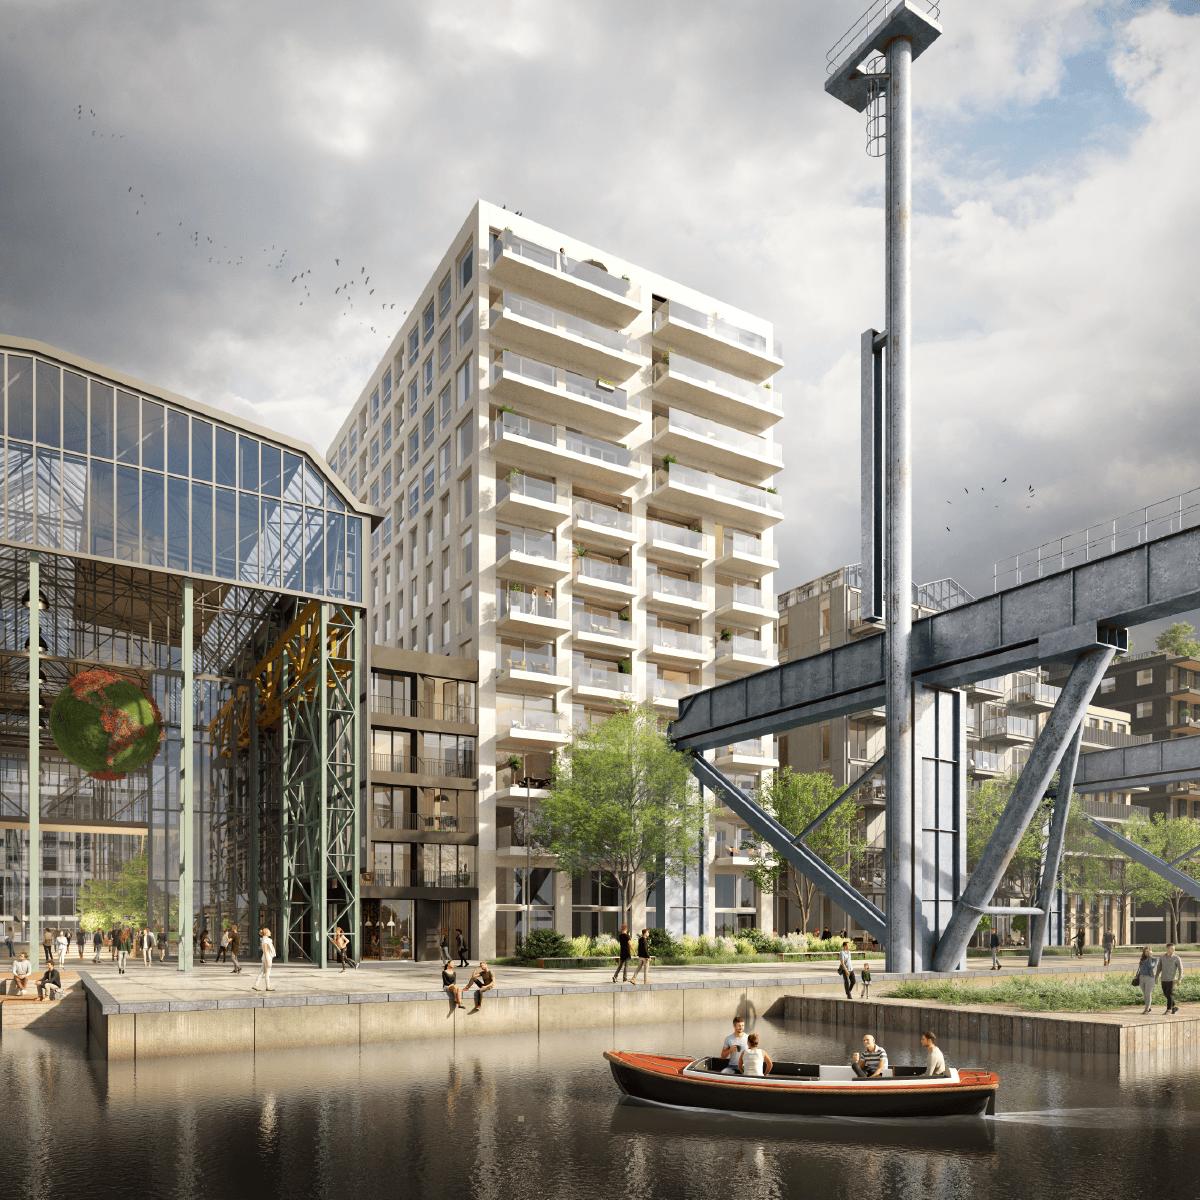 Homines-bouw-oostenburg-appartementen-amsterdam-1